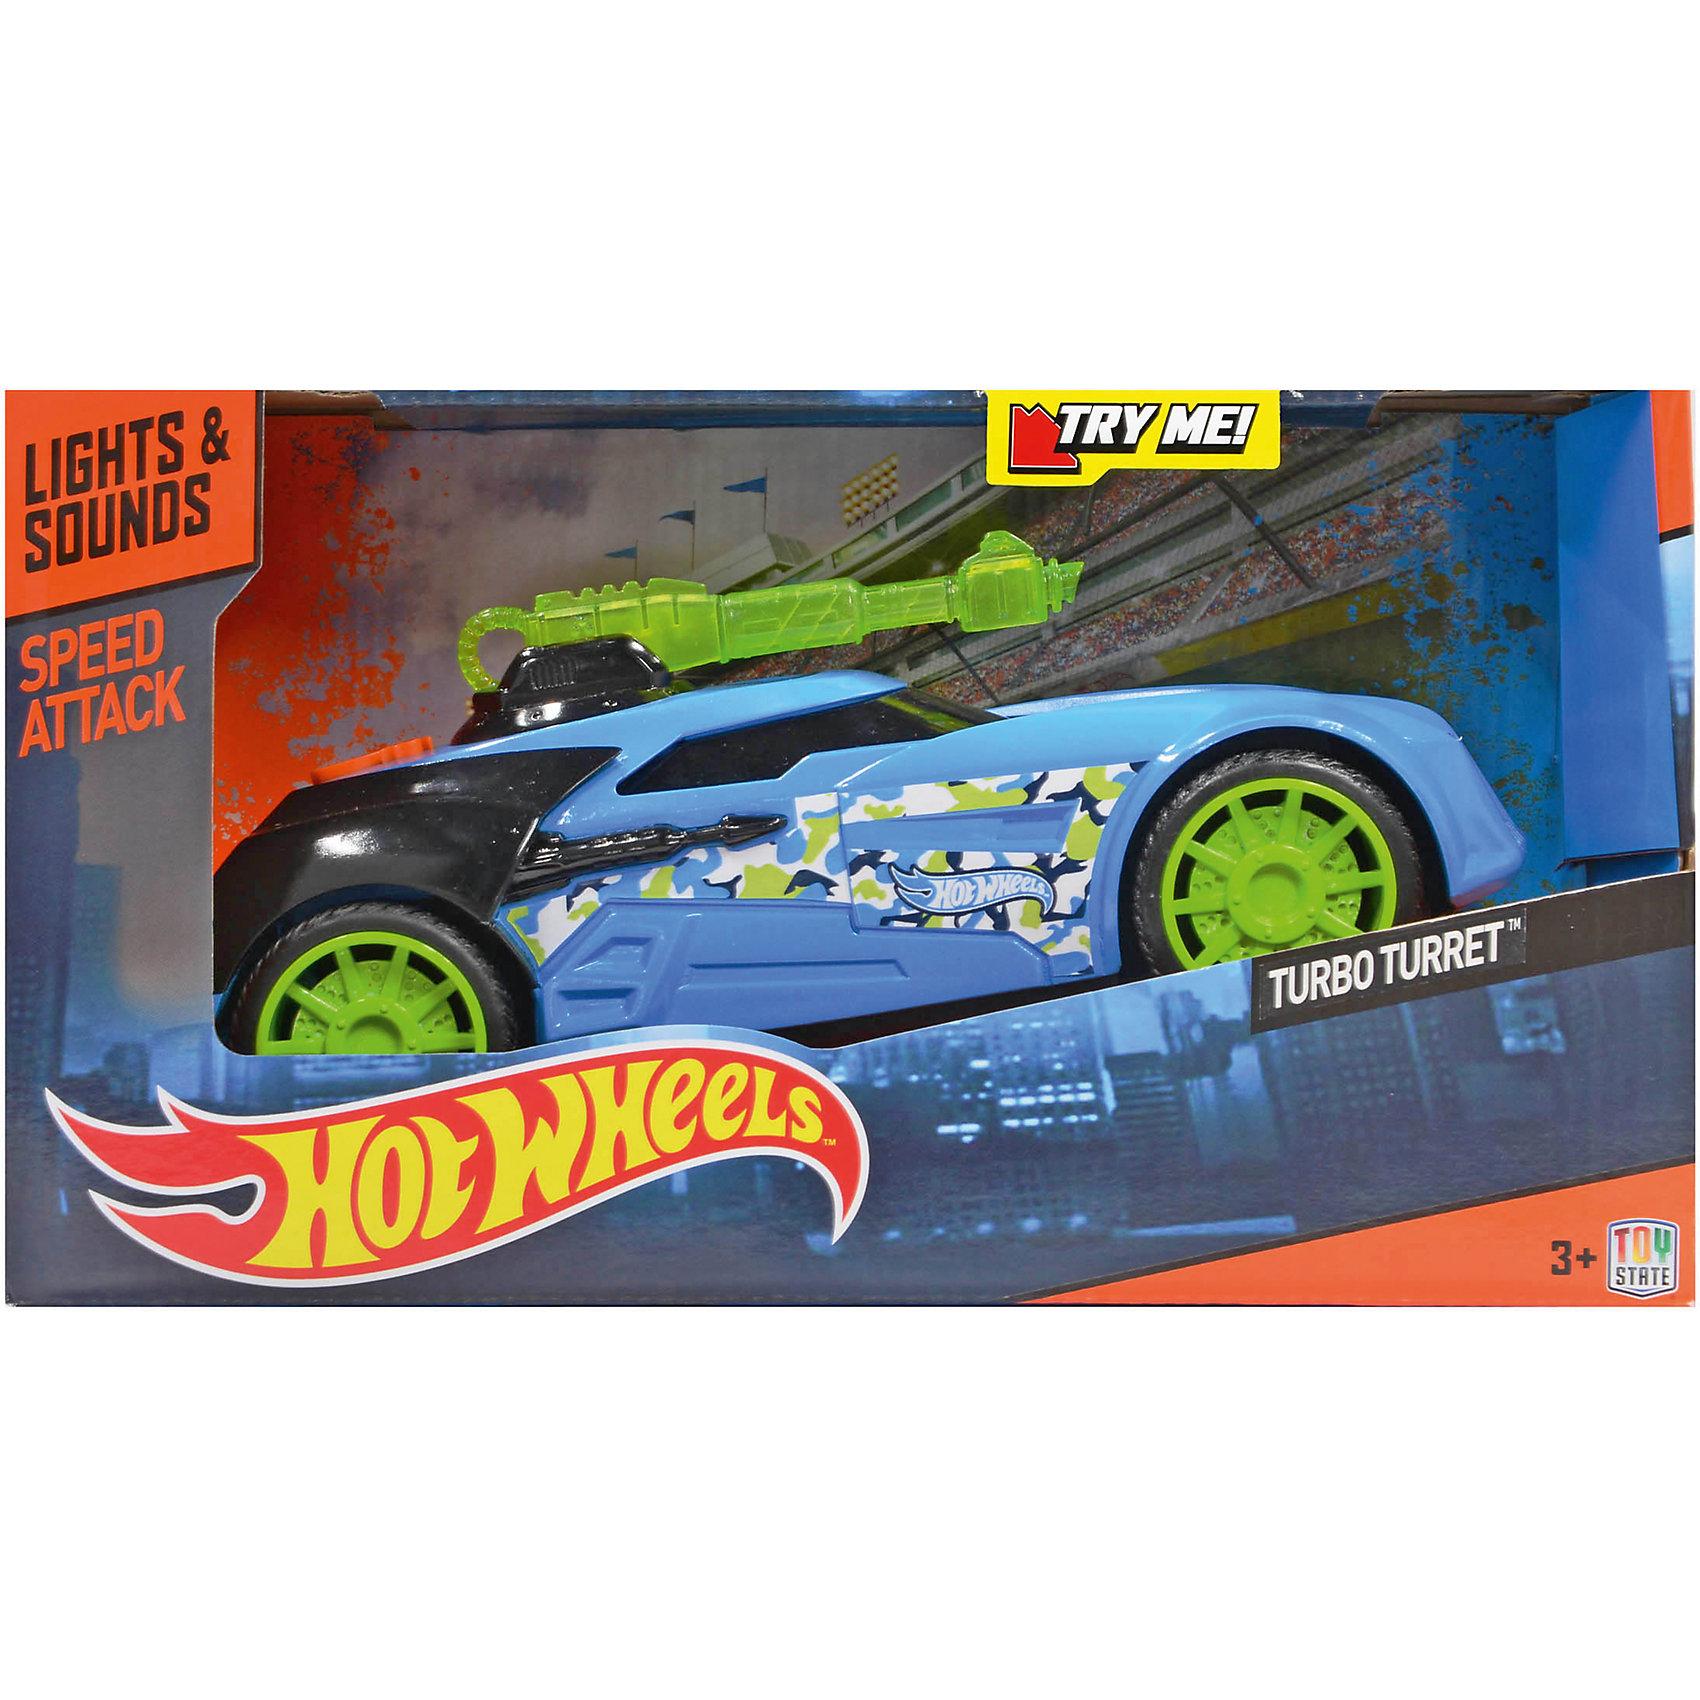 Машинка на батарейках, голубая, 27 см, Hot Wheels